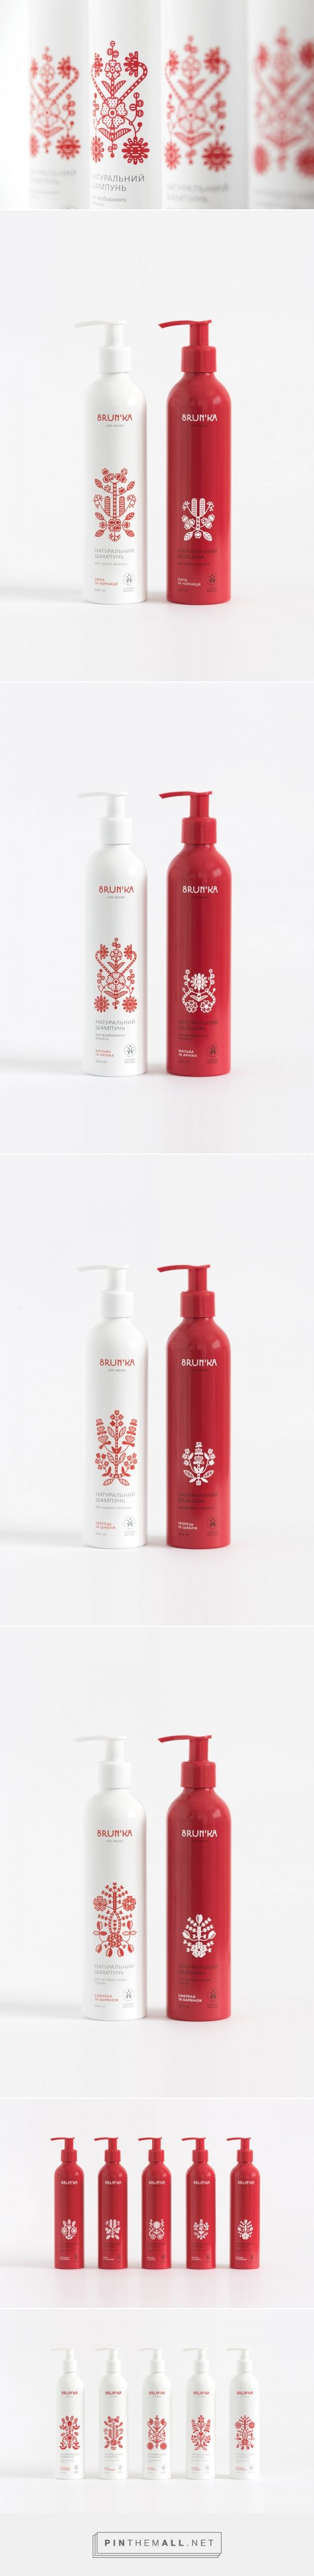 Brun'ka  / organic cosmetics packaging design by Yurko Gutsulyak